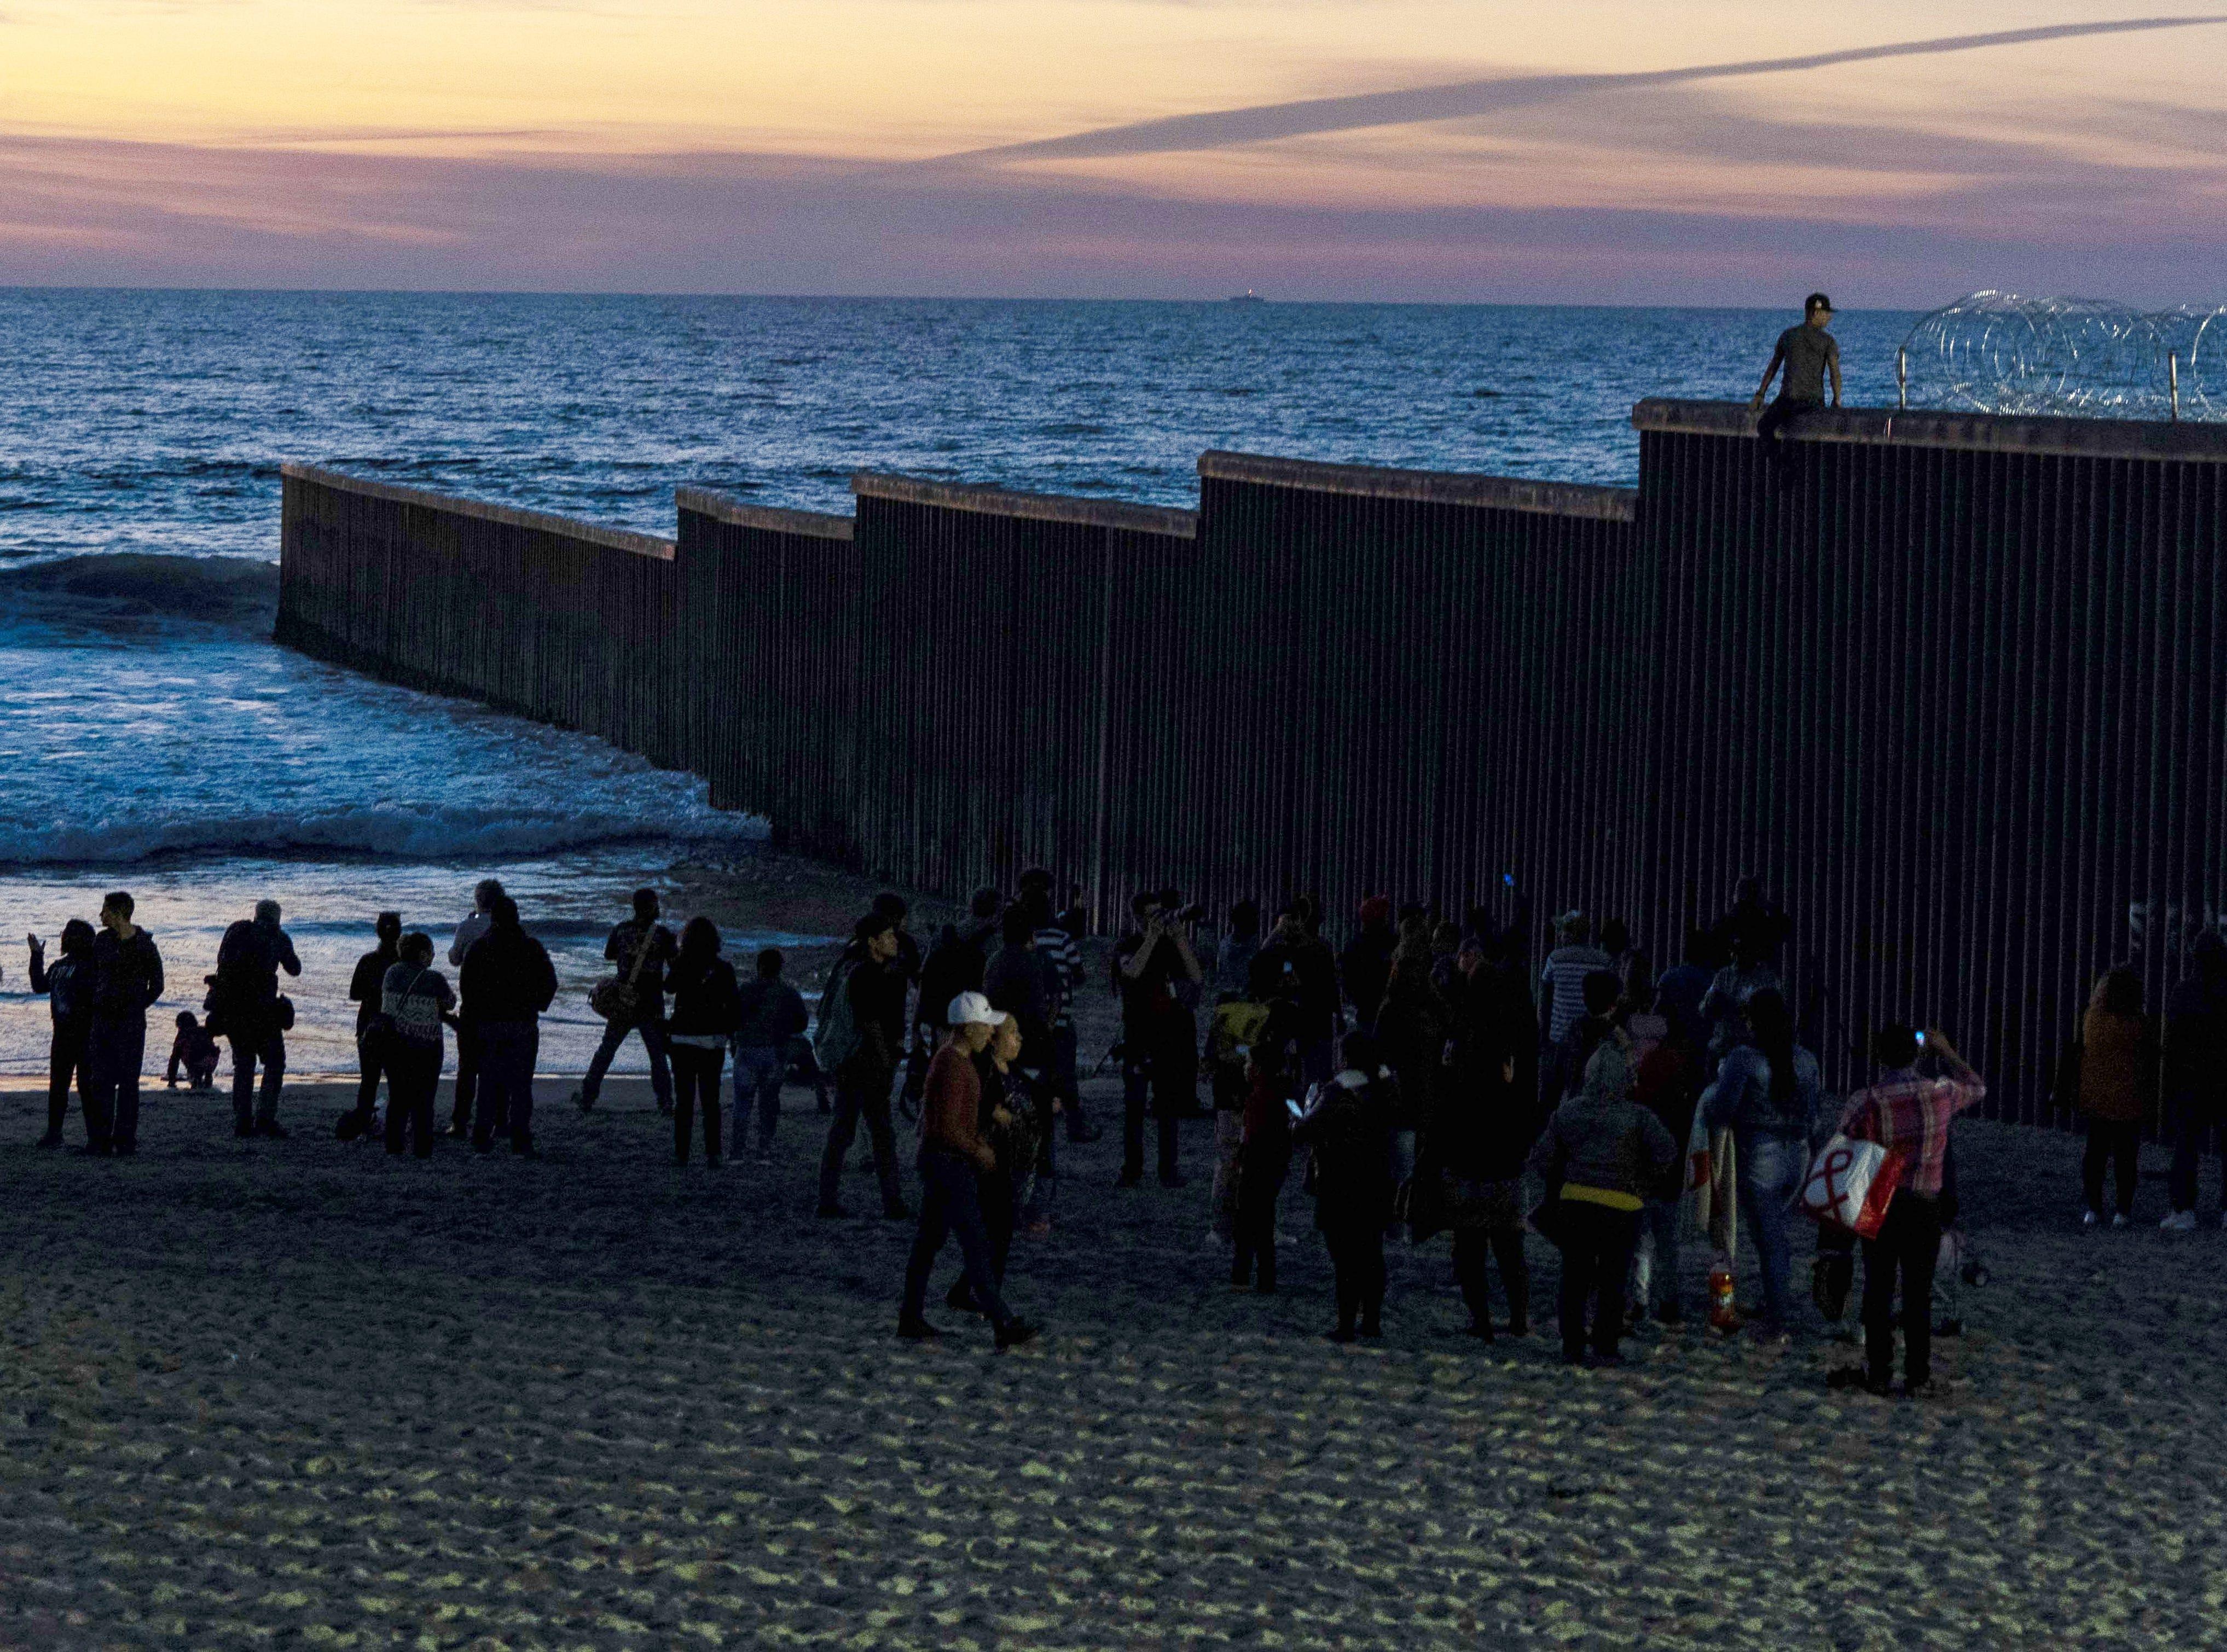 Man tries to climb over atop the U.S.-Mexico border fence on Nov. 18, 2018, at Playas de Tijuana, Mexico.